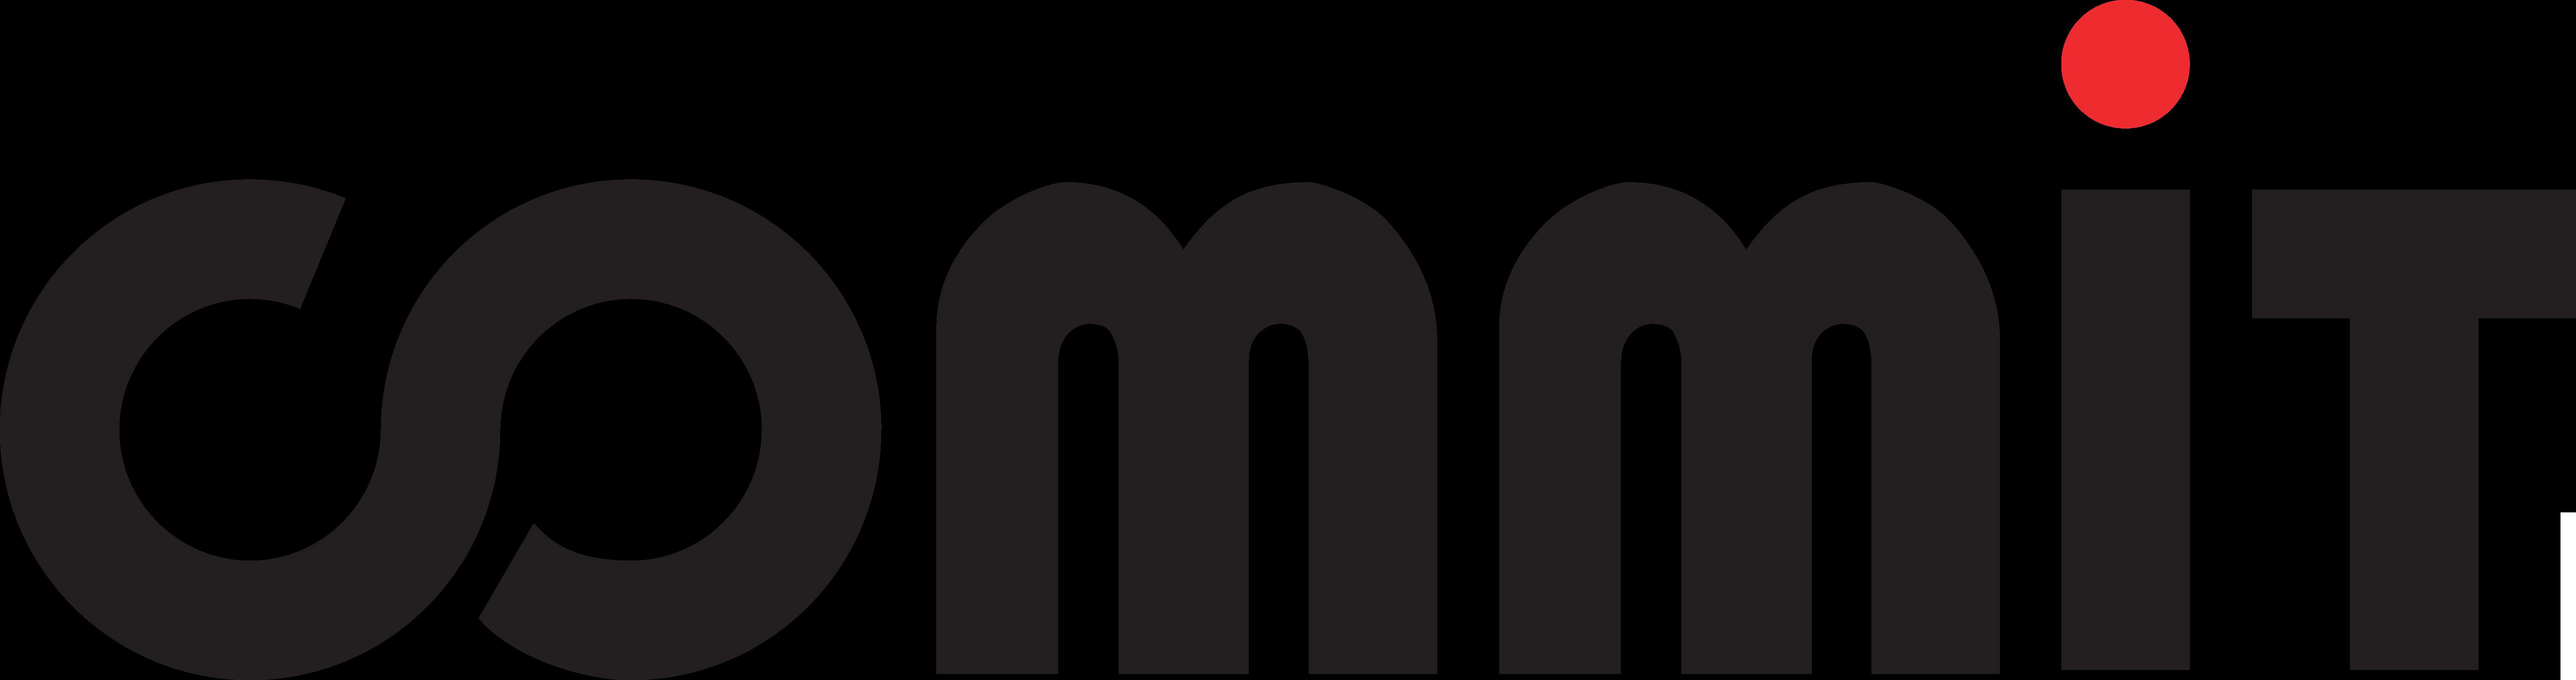 commit logo